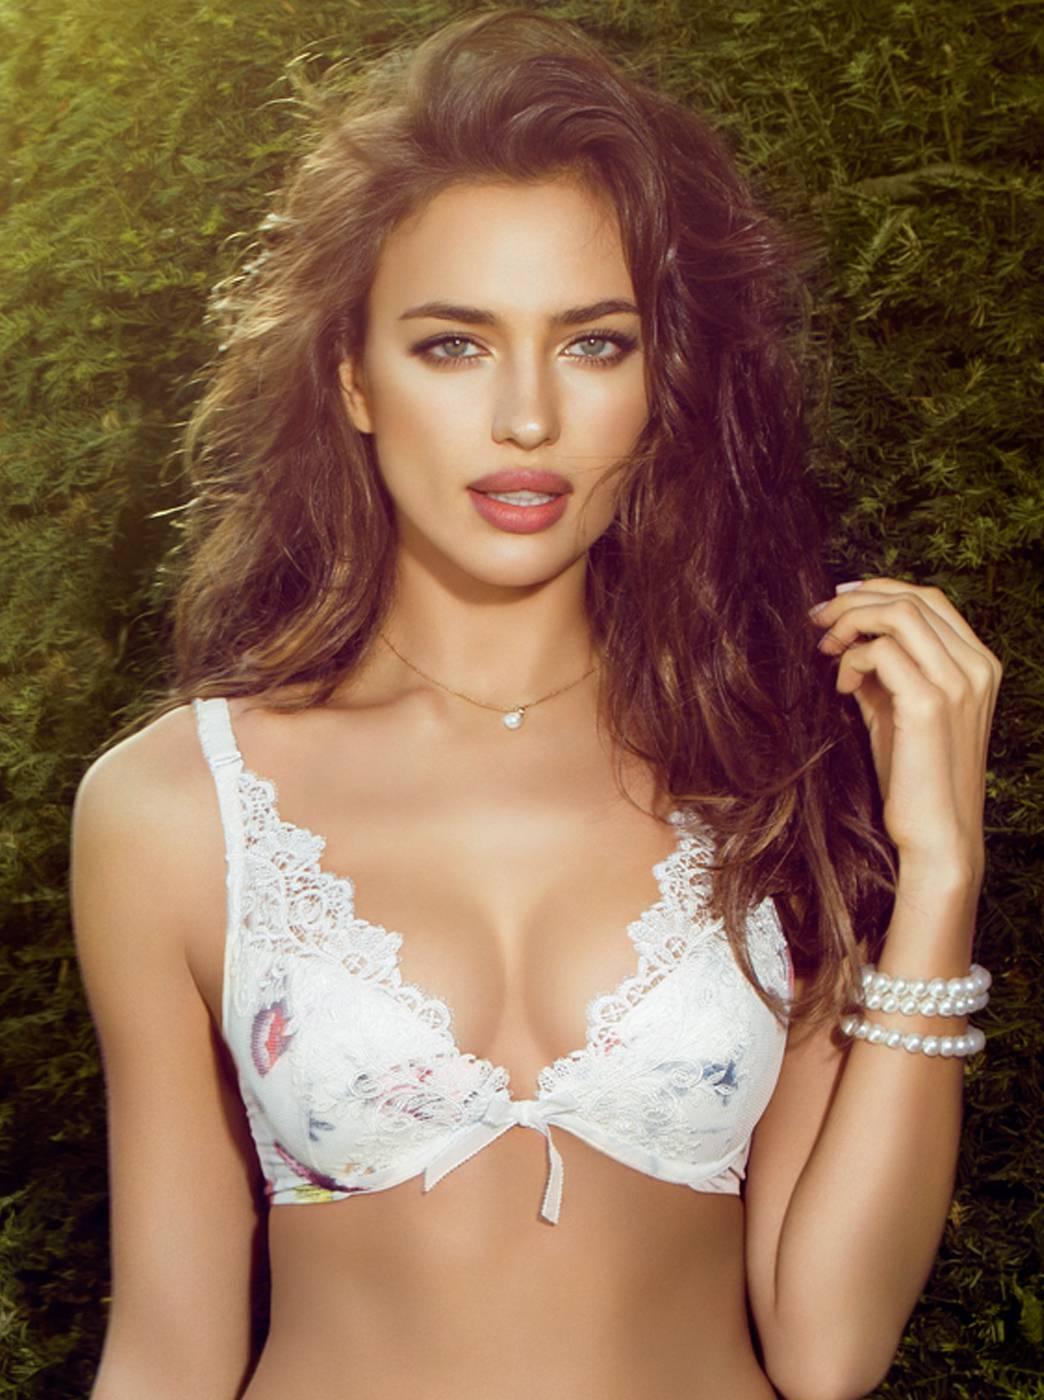 Irina Shayk Photo (Ирина Шейк Фото) модель, невеста Кришиано Рональдо